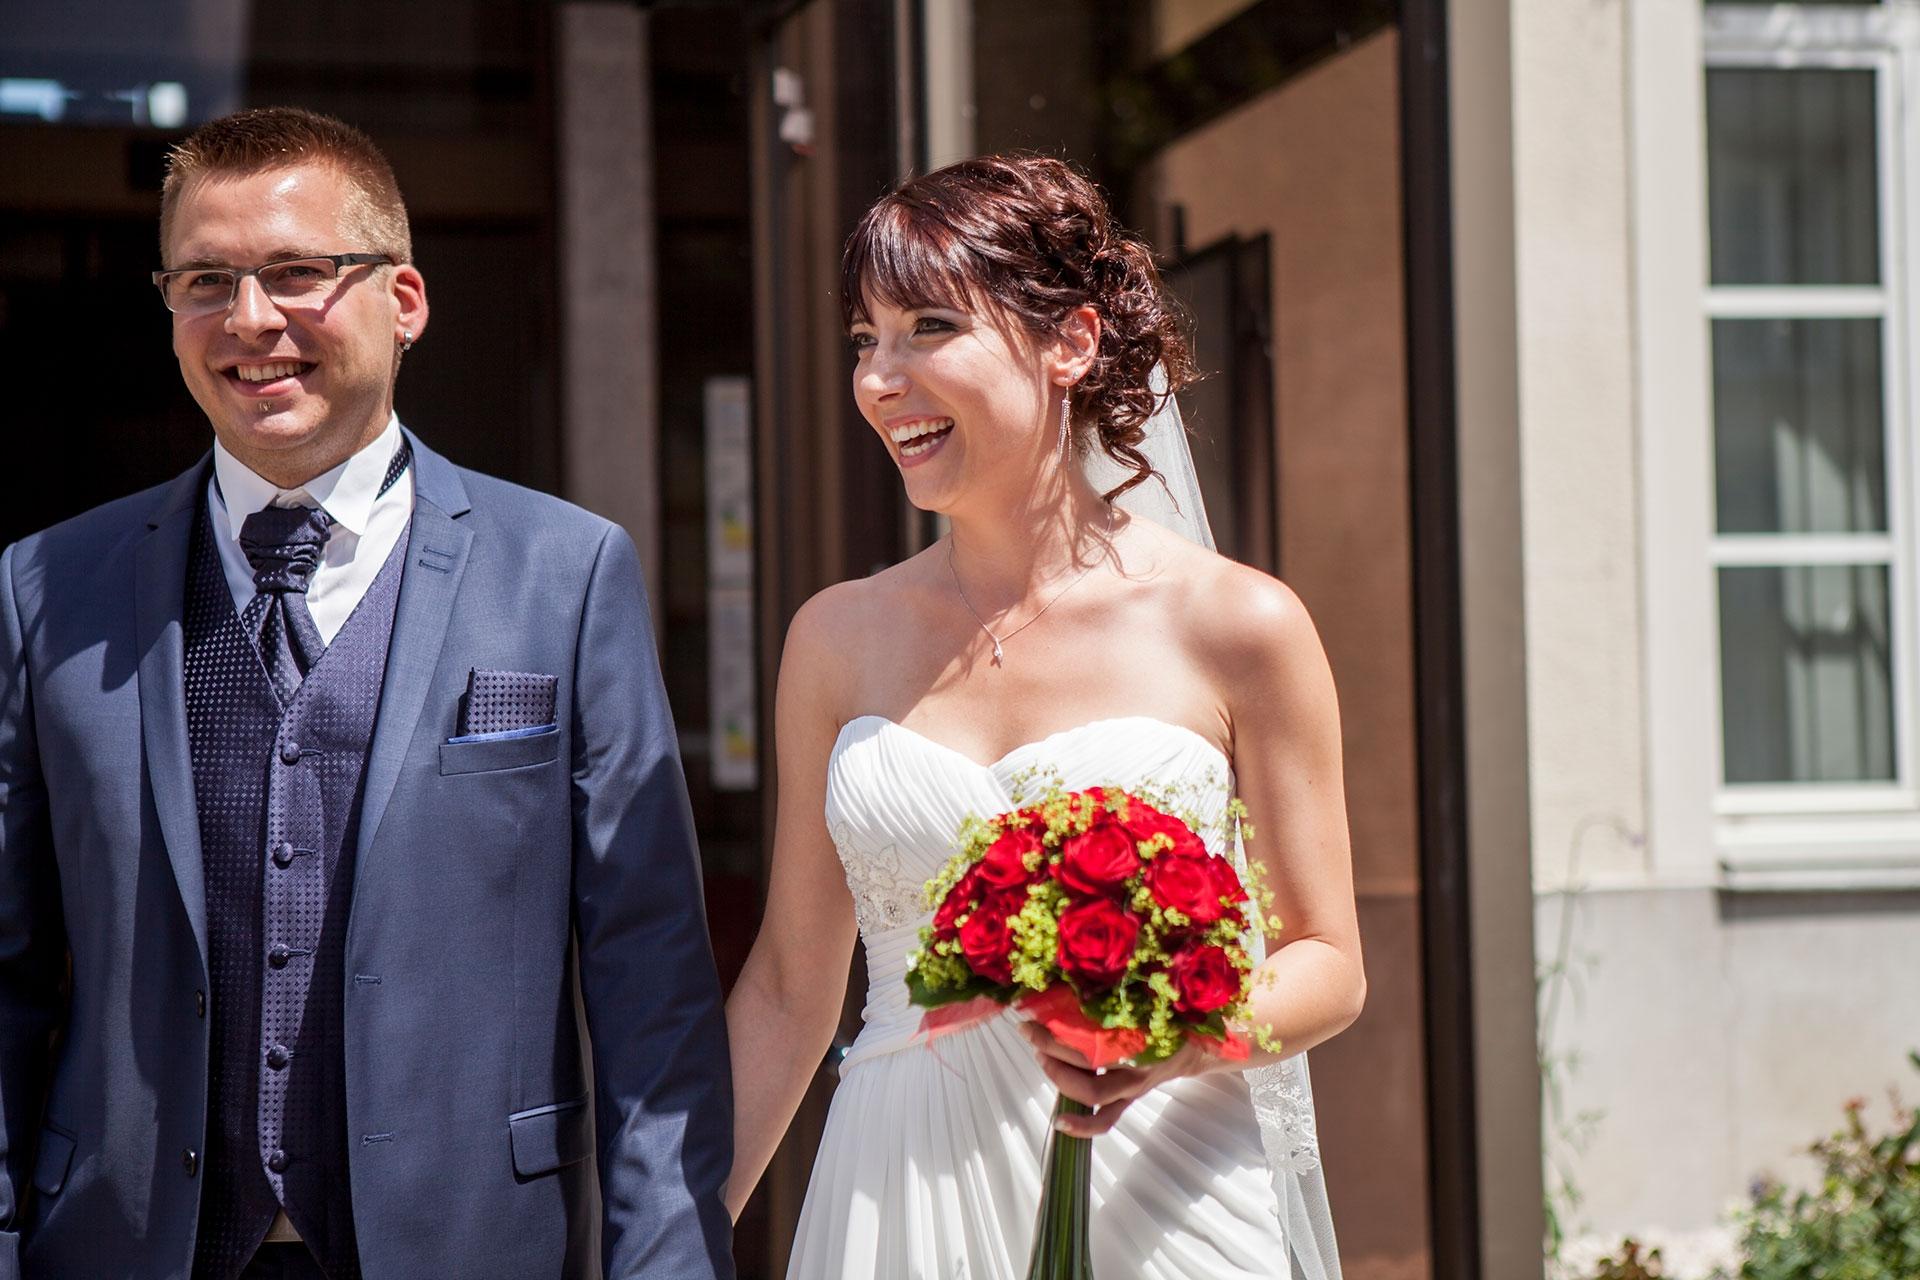 particuliers-evenements-mariages-oui-aurelie&geoffrey-07